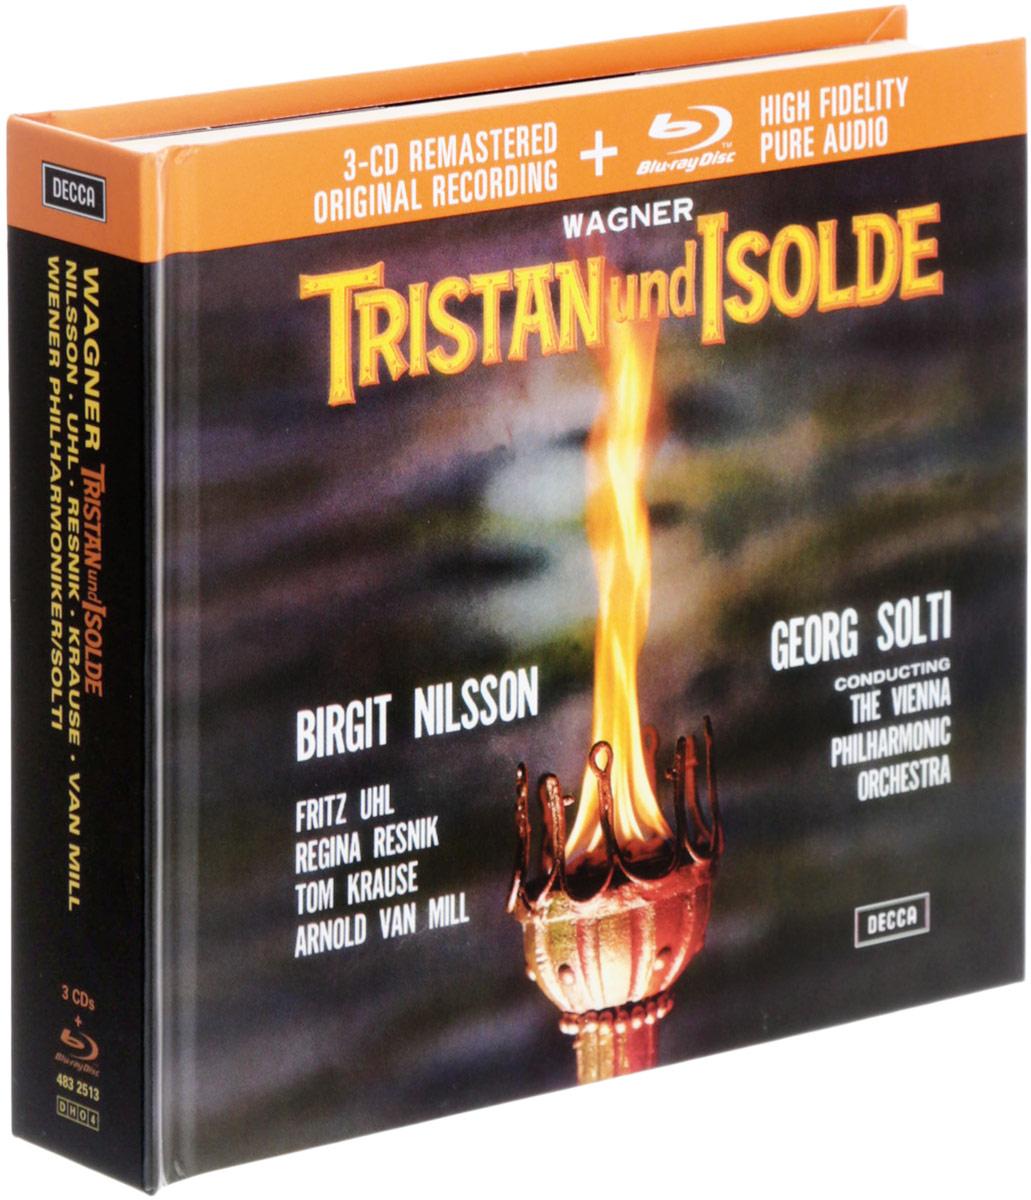 Tristan Und Isolde (4 CD + Blu-ray) драматическая коллекция 4 blu ray